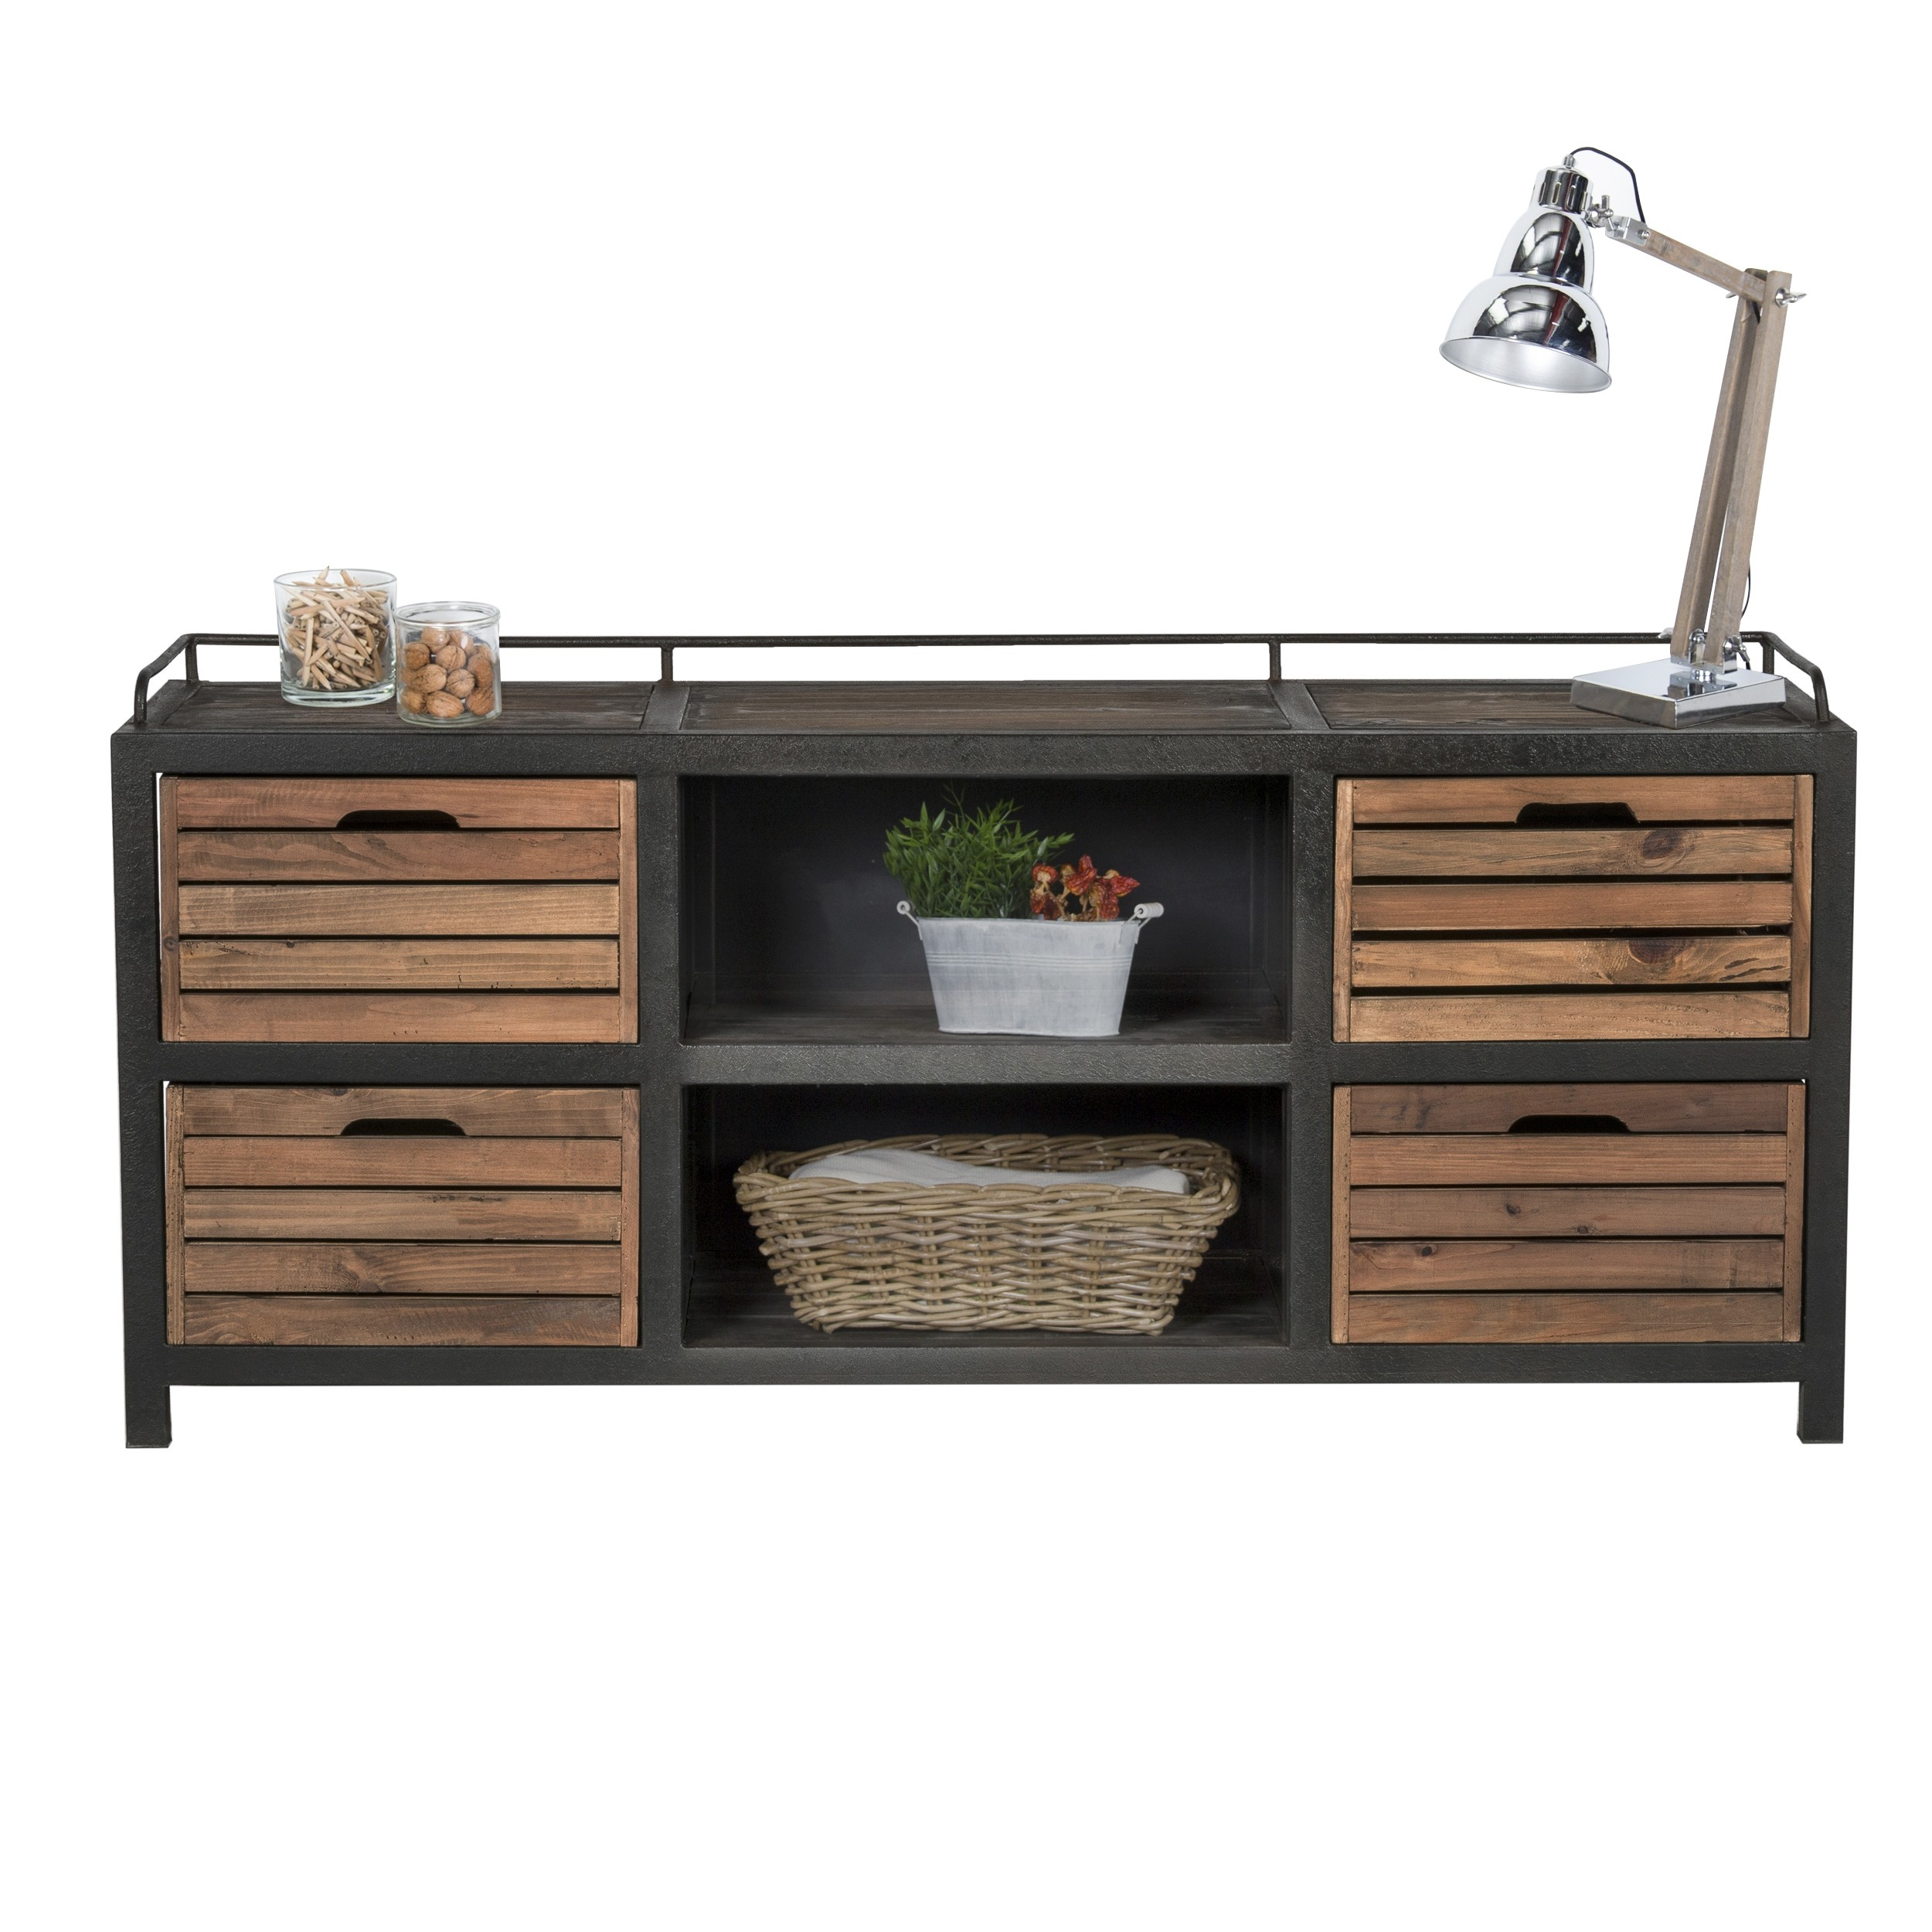 acheter buffet bois et metal rectangulaire